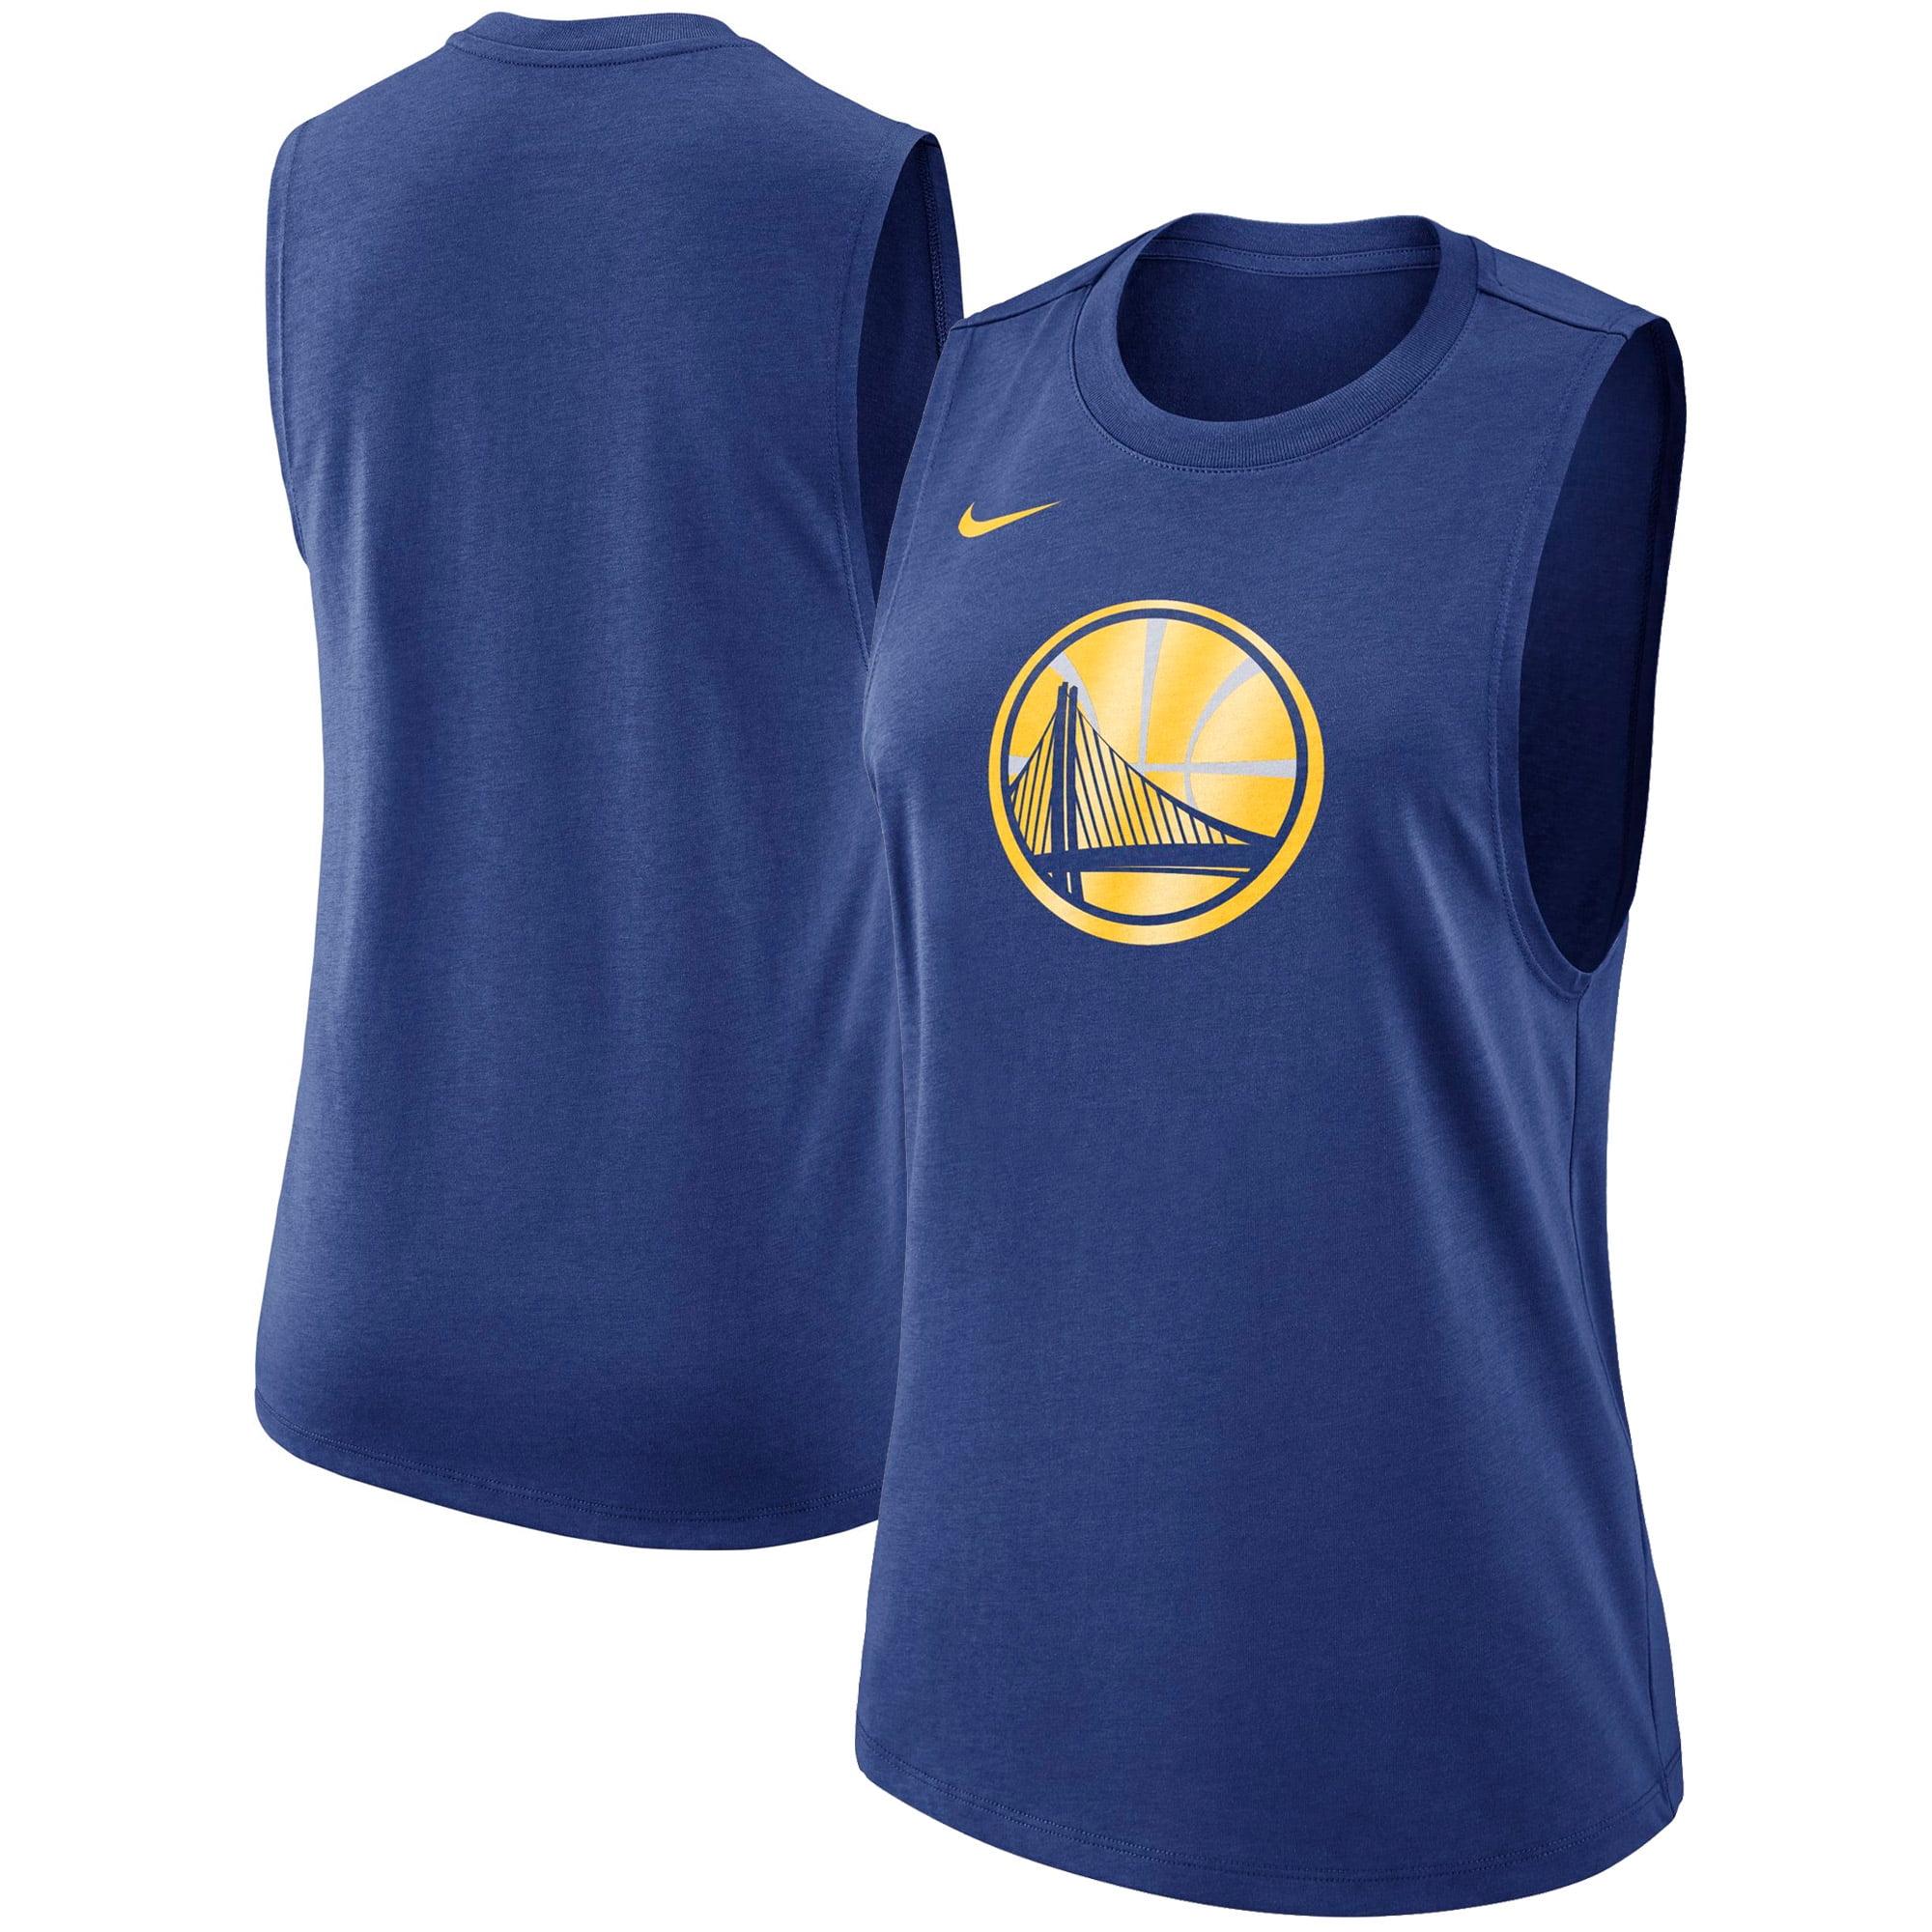 Golden State Warriors Nike Women's Primary Logo Tank Top - Royal